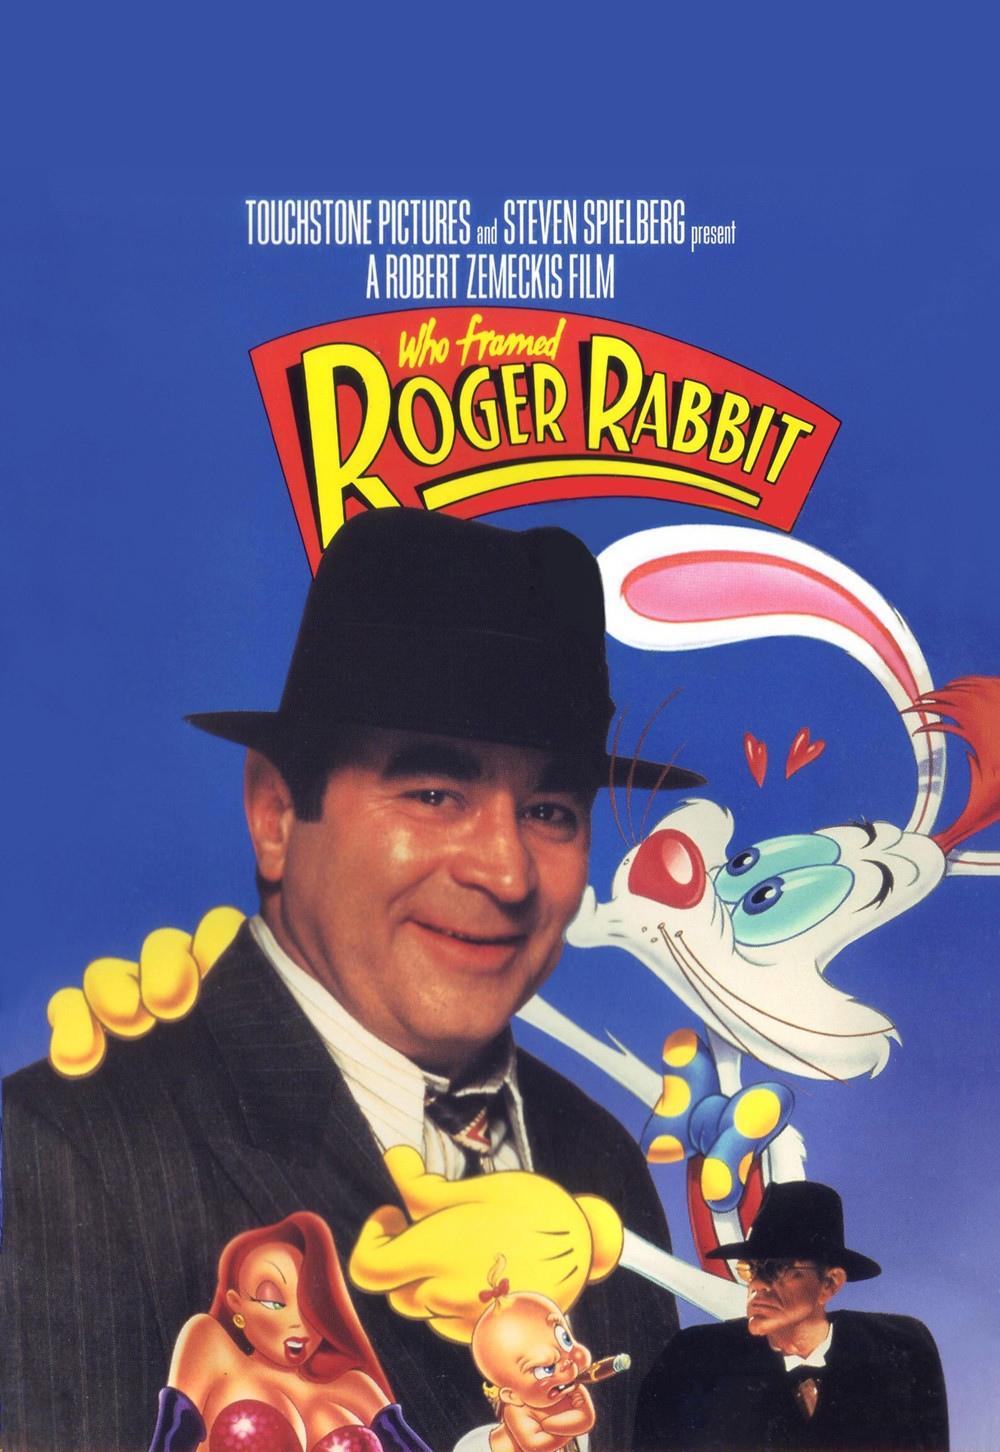 Monday Night Movie: Who Framed Roger Rabbit? | Camden Public Library